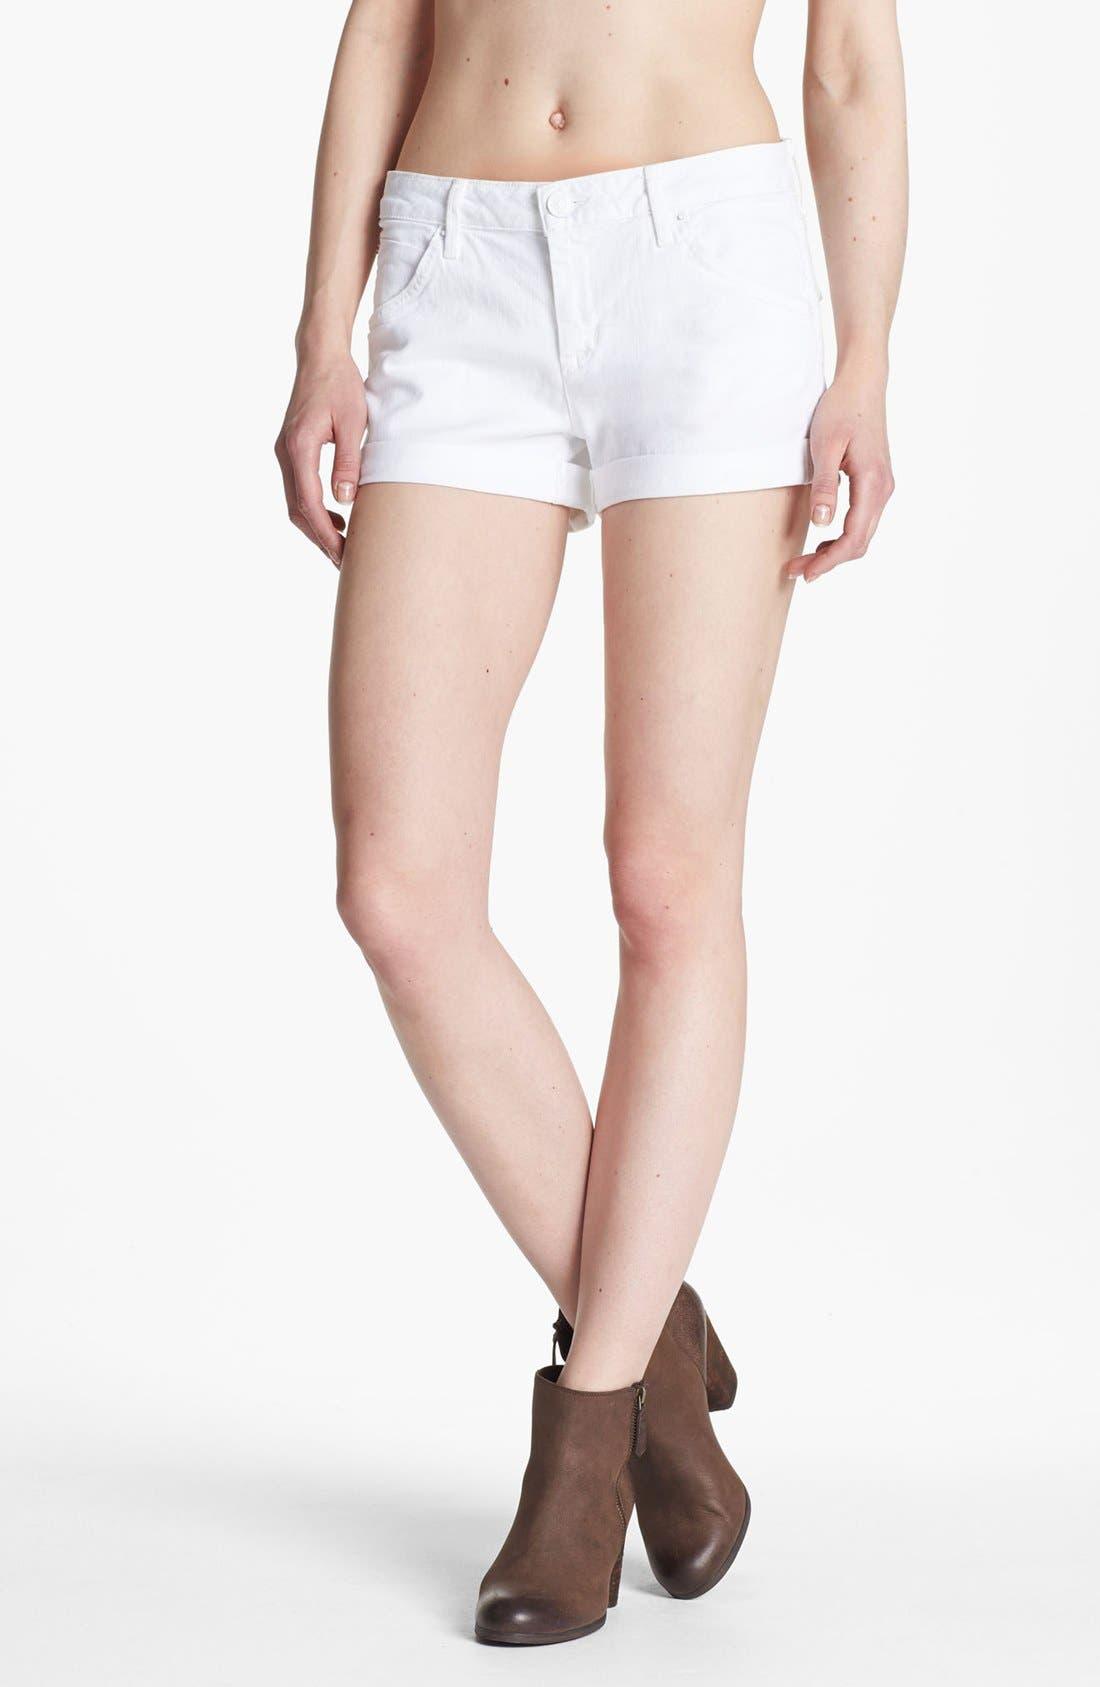 Alternate Image 1 Selected - Hudson Jeans 'Hampton' Cuff Jean Shorts (White)